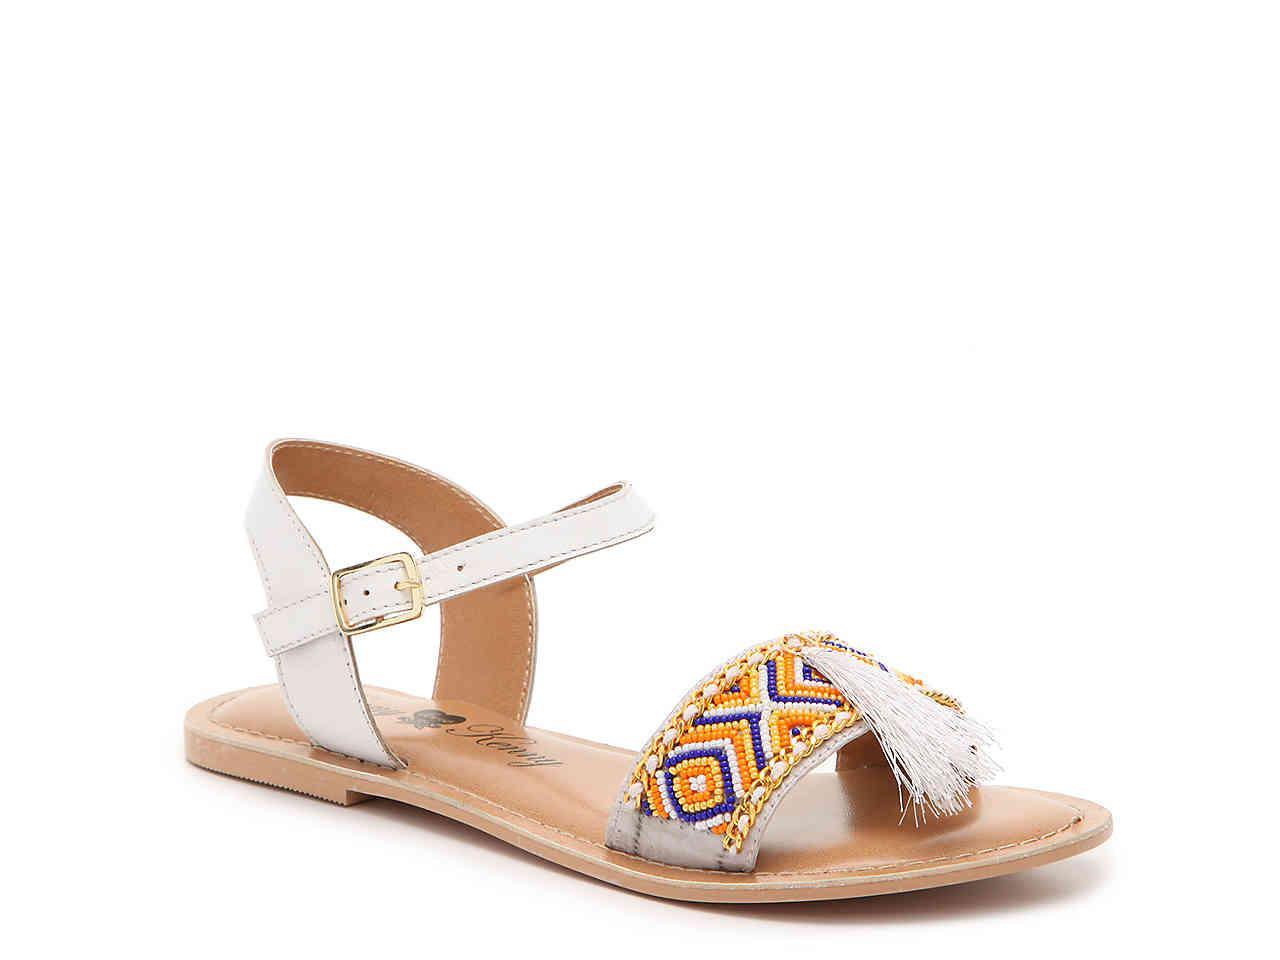 Penny Loves Kenny Syclone Tassel Ankle Strap Sandal (Women's) mgUXj